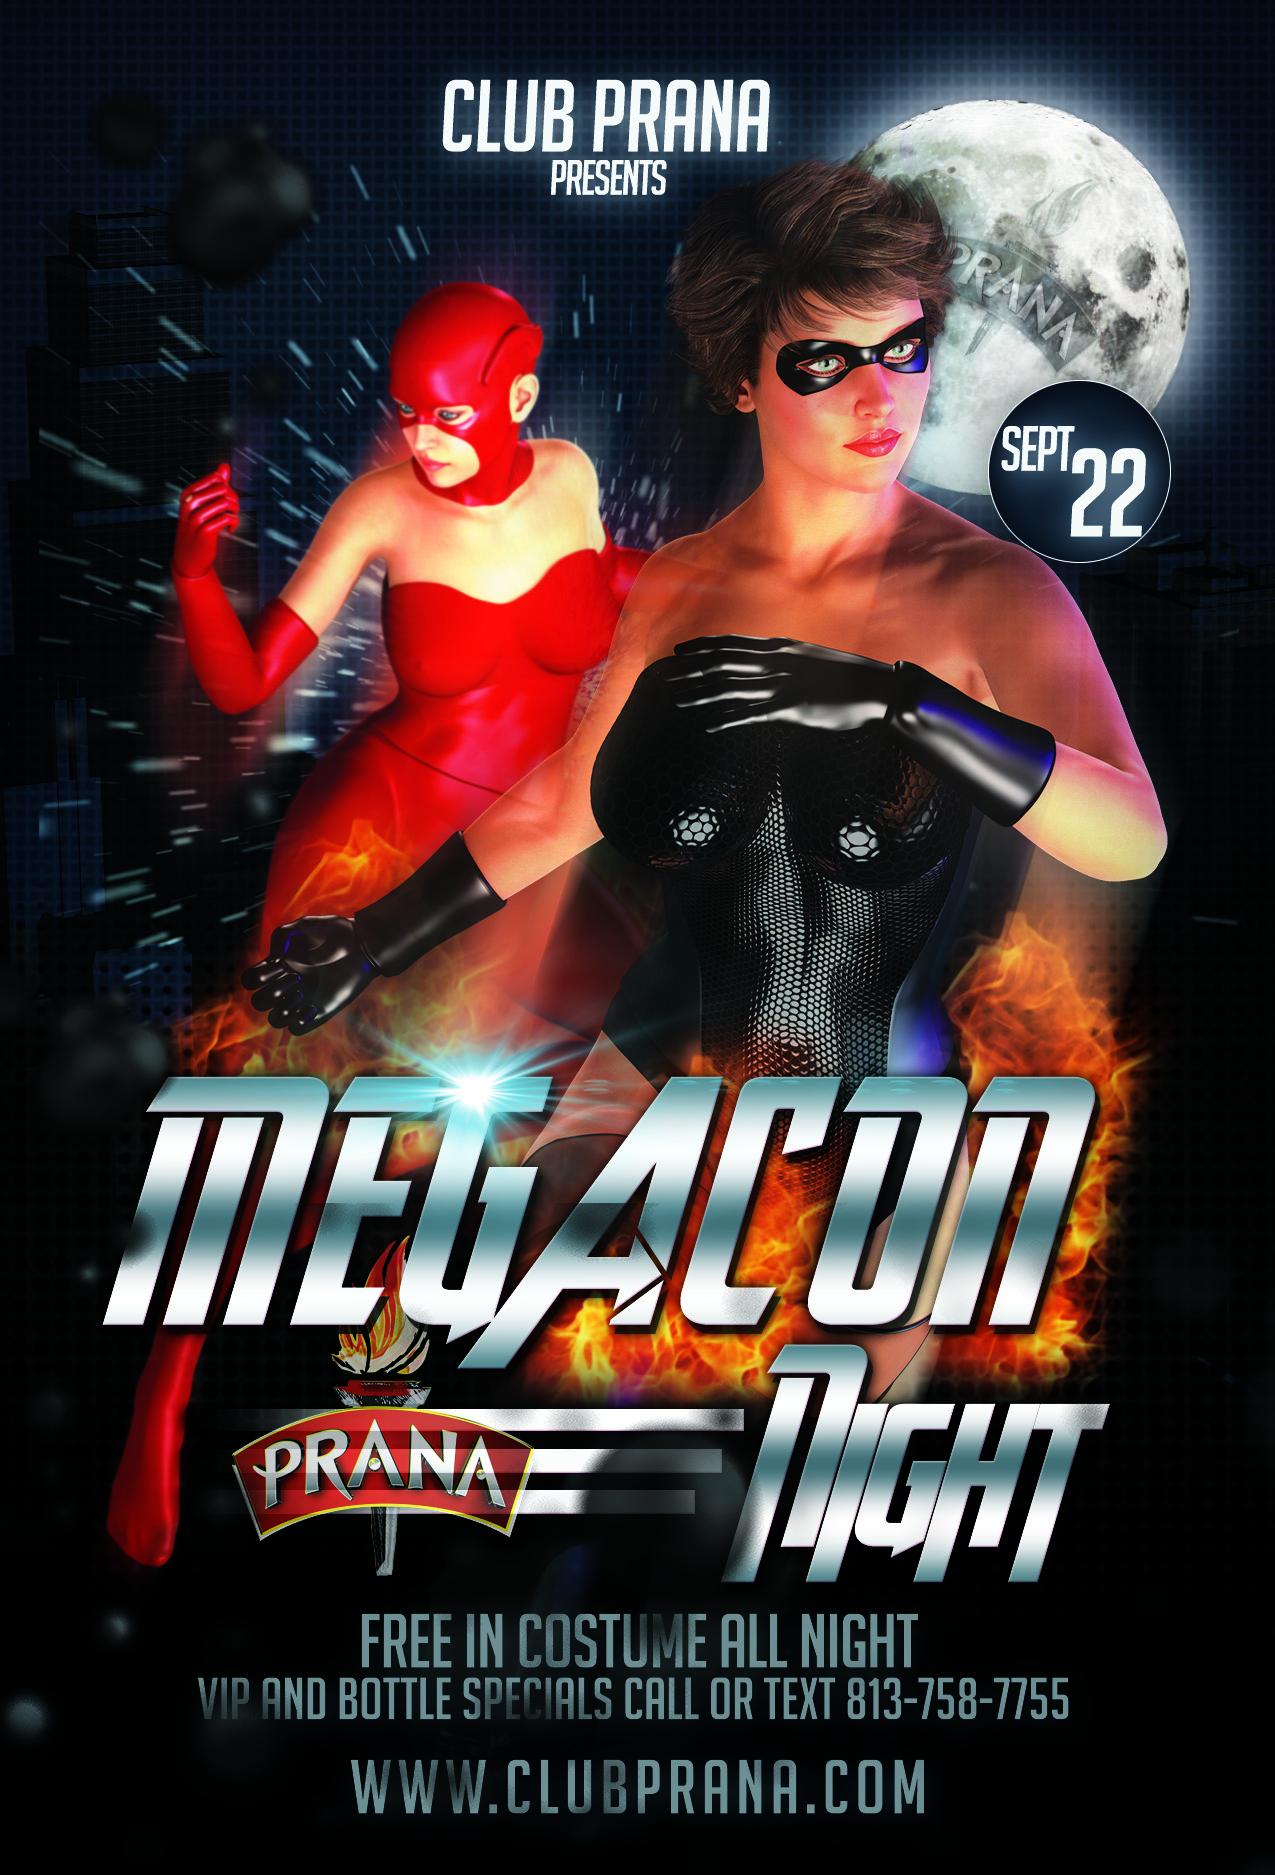 Megacon Night